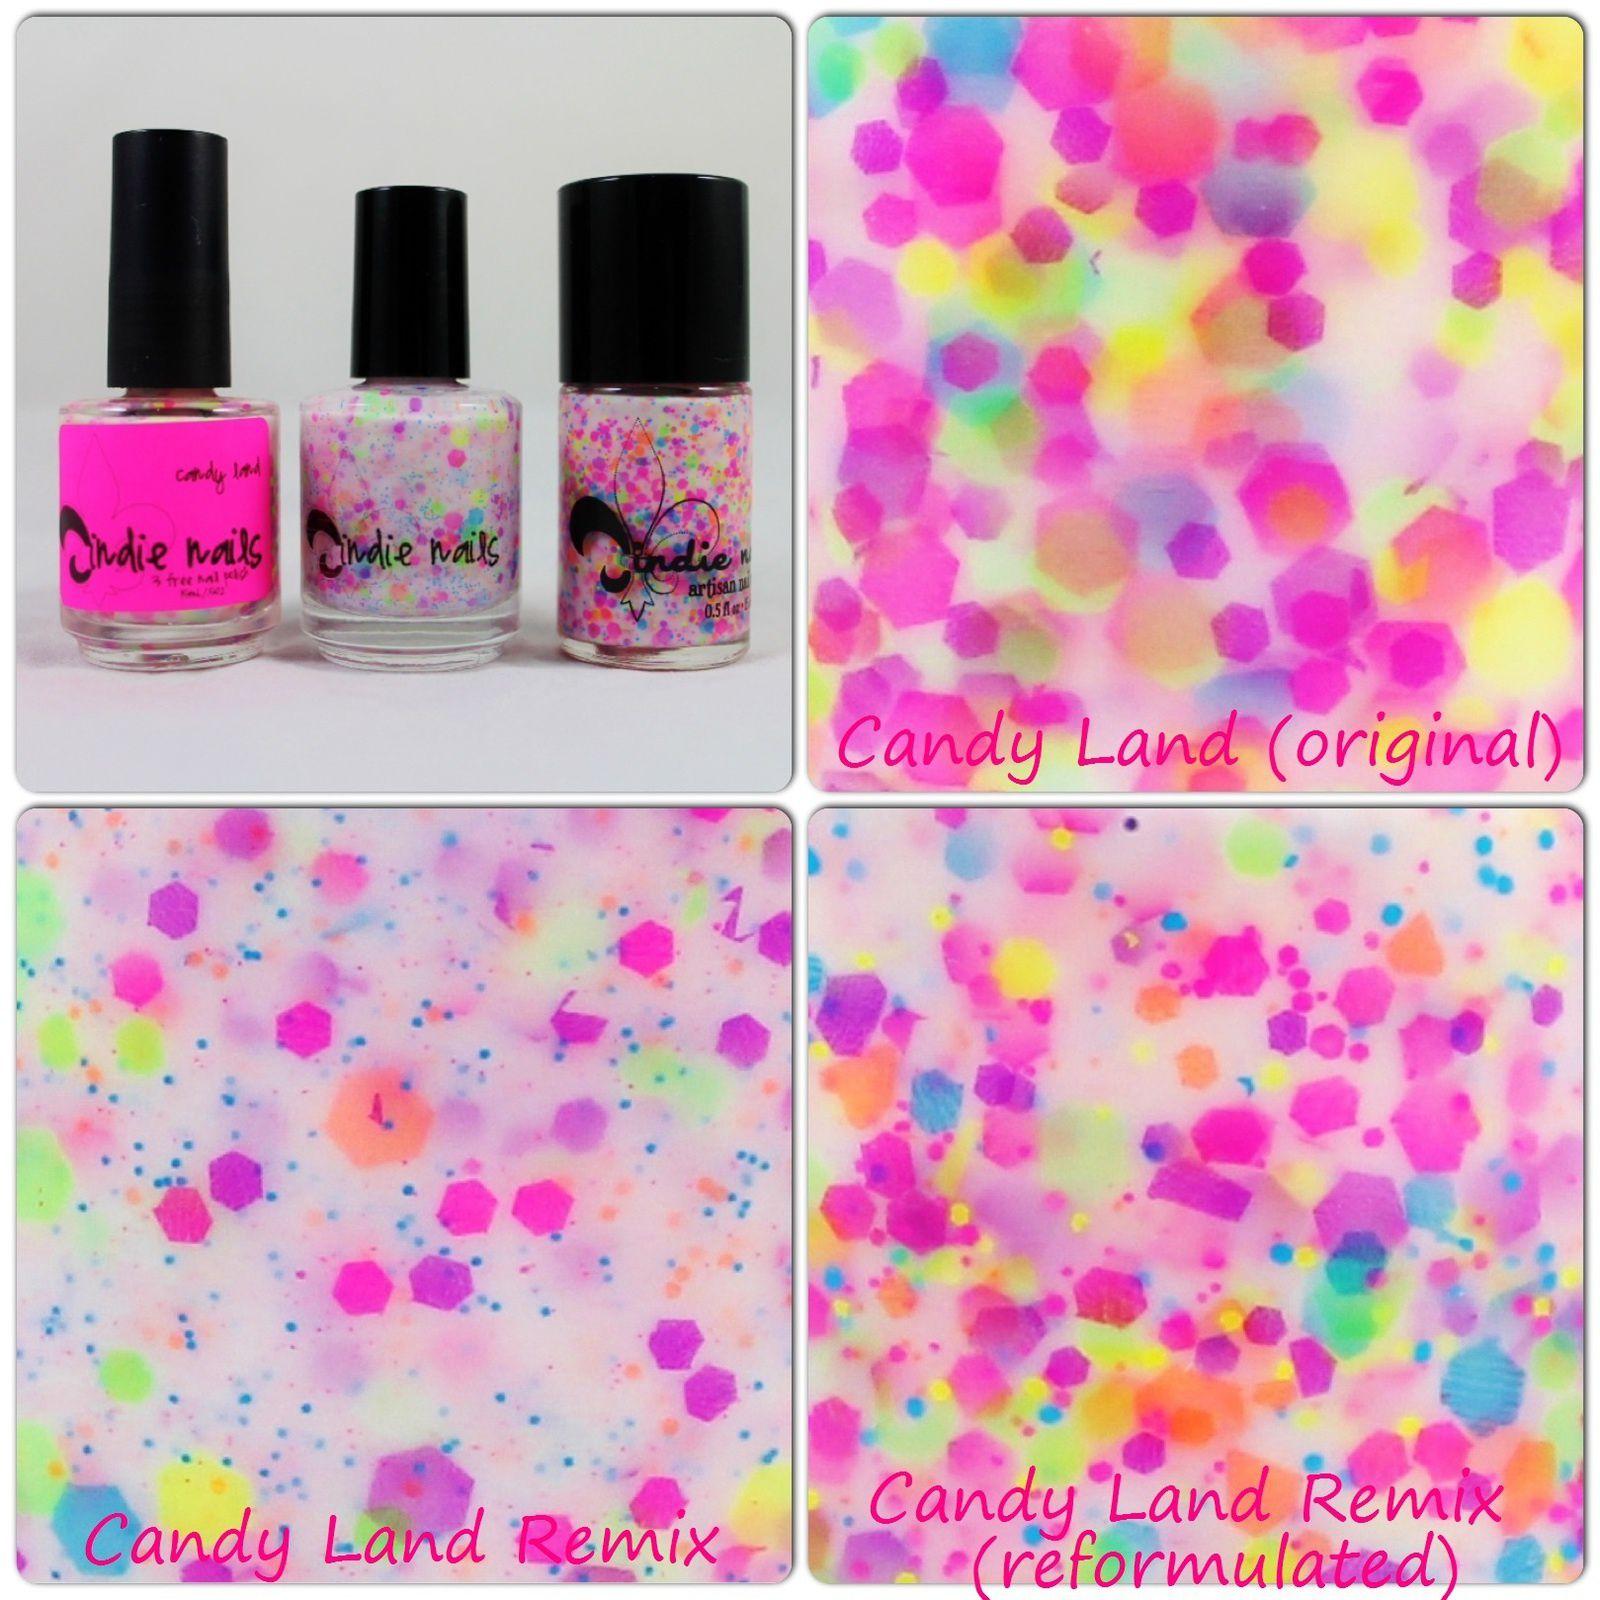 Candy Land (original) /  Candy land Remix / Candy Land Remix (reformulated)